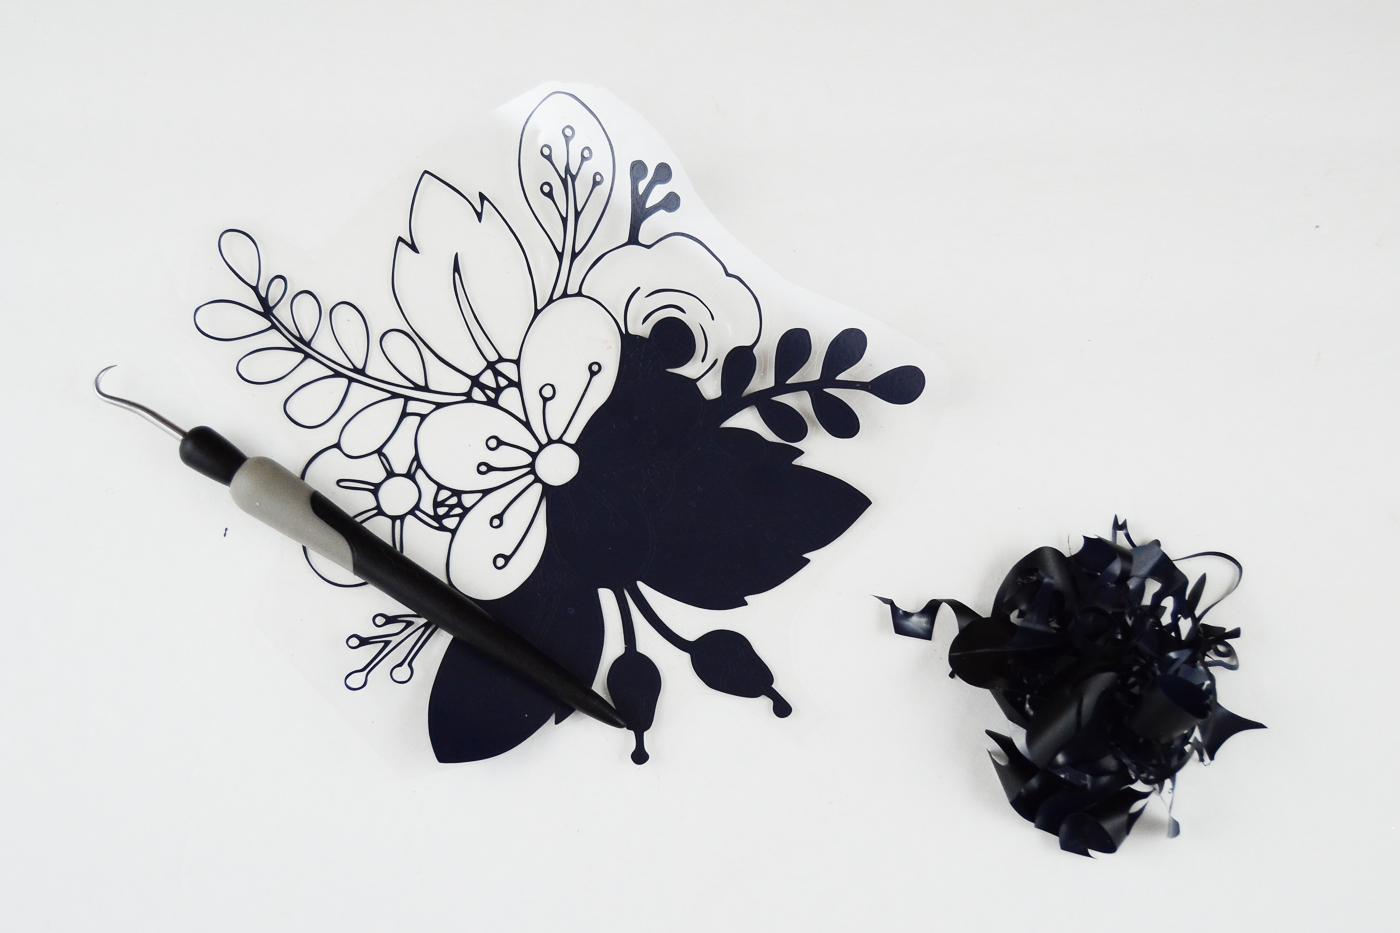 Floral Coloring Book Styled DIY Tea Towel - diycandy.com